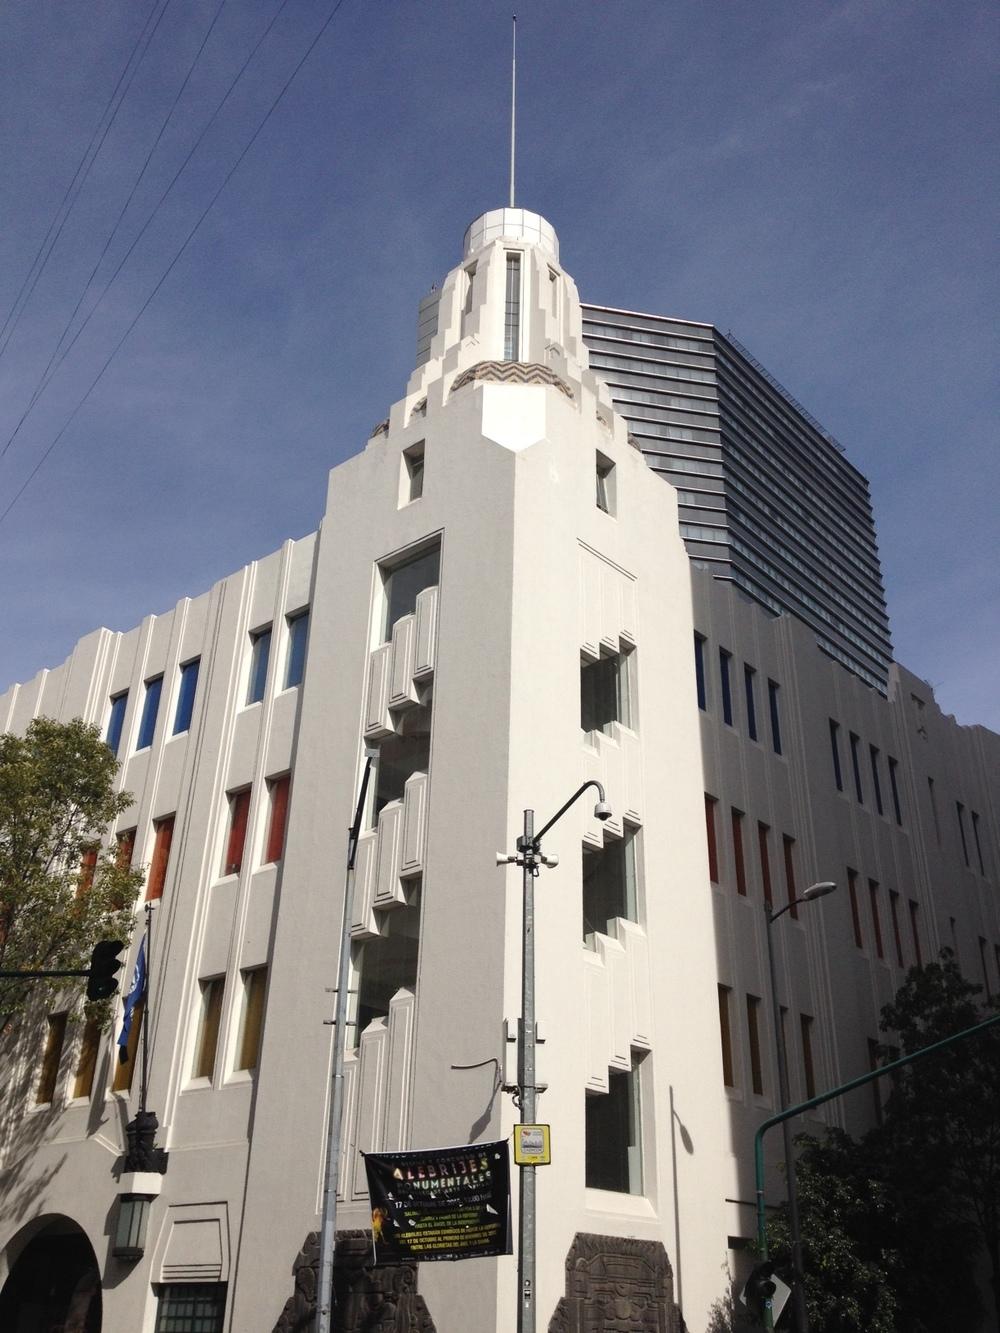 The classic art deco building was originally the Fire Department Headquarters.